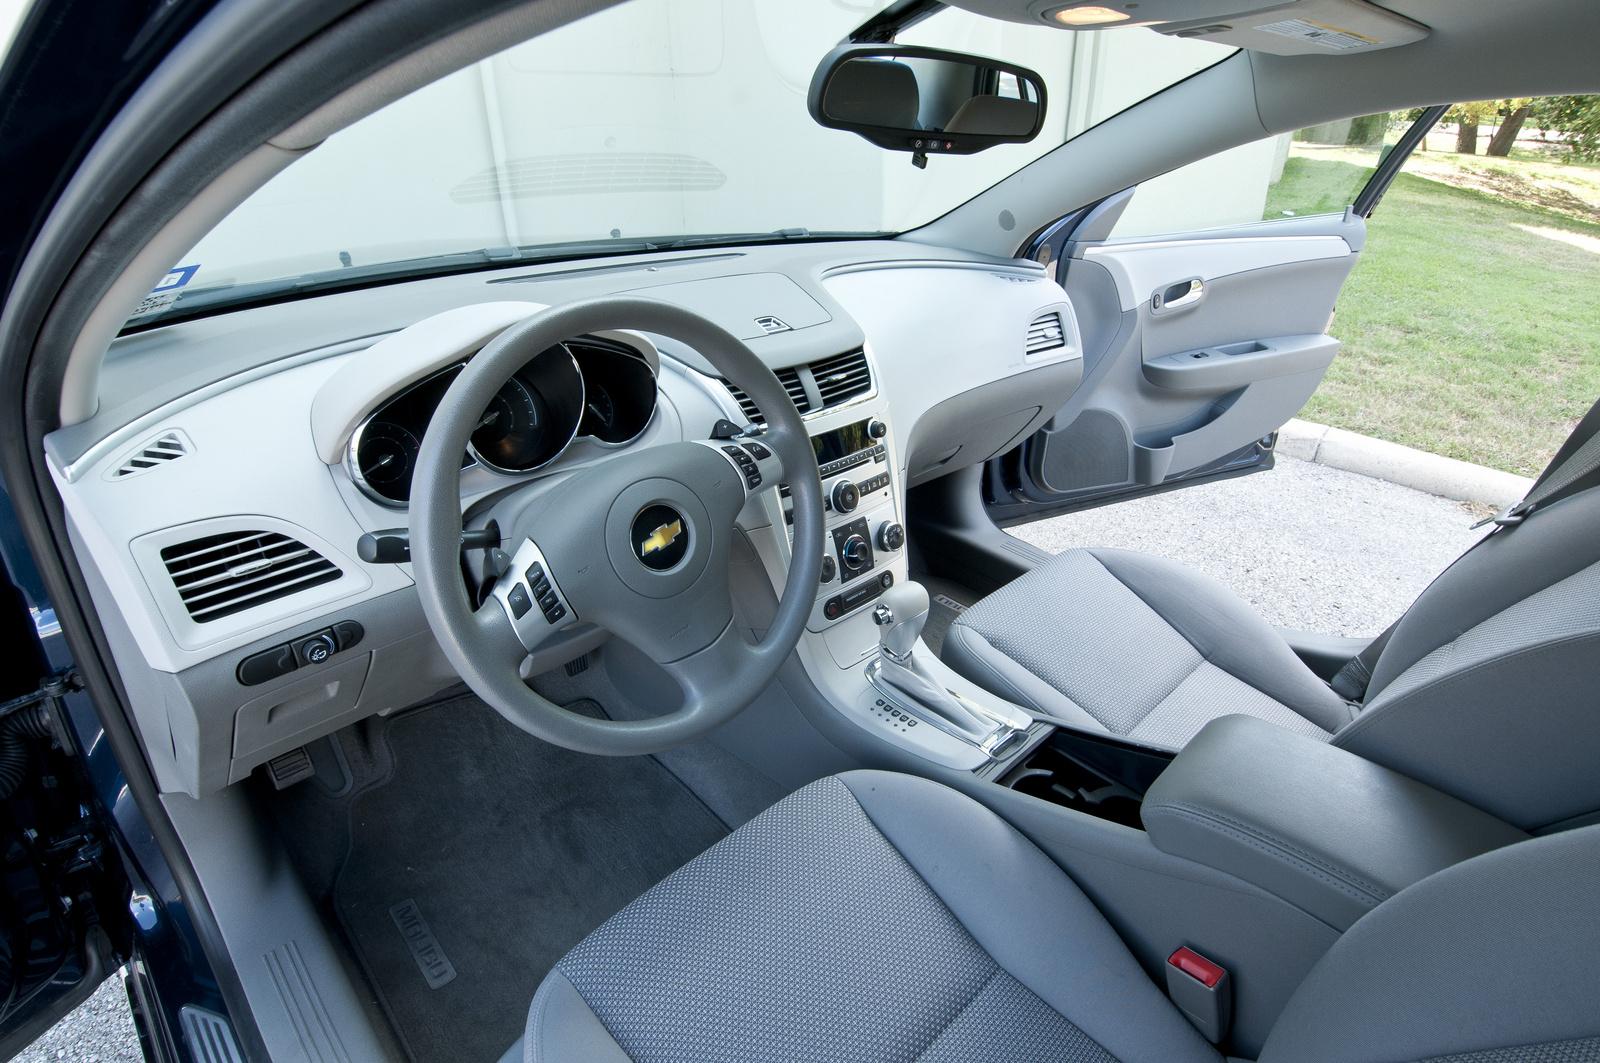 2010 chevrolet malibu - interior pictures